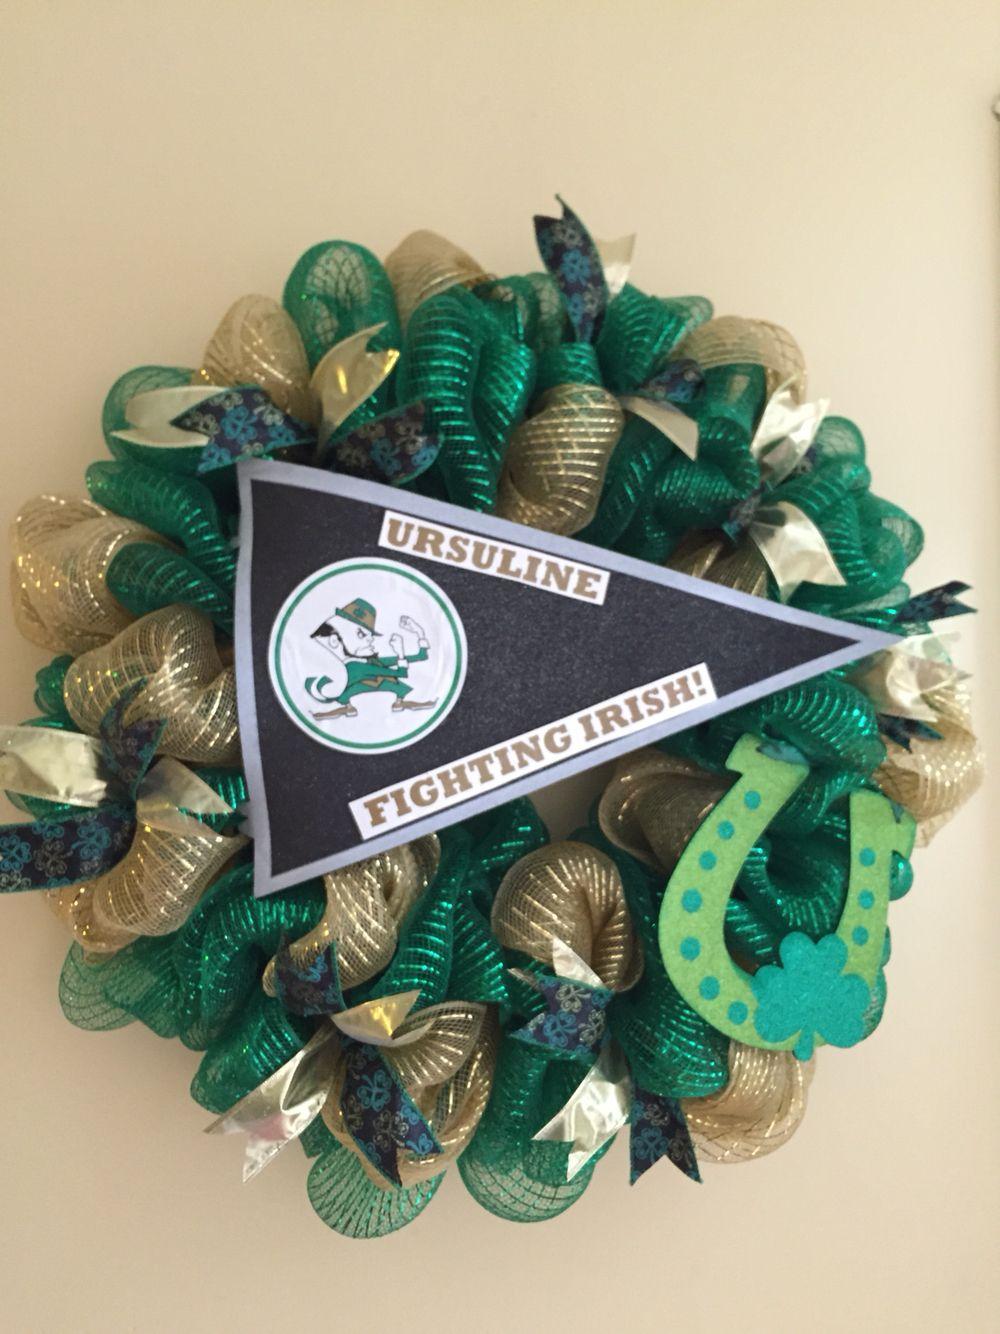 Ursuline high school wreath green and gold